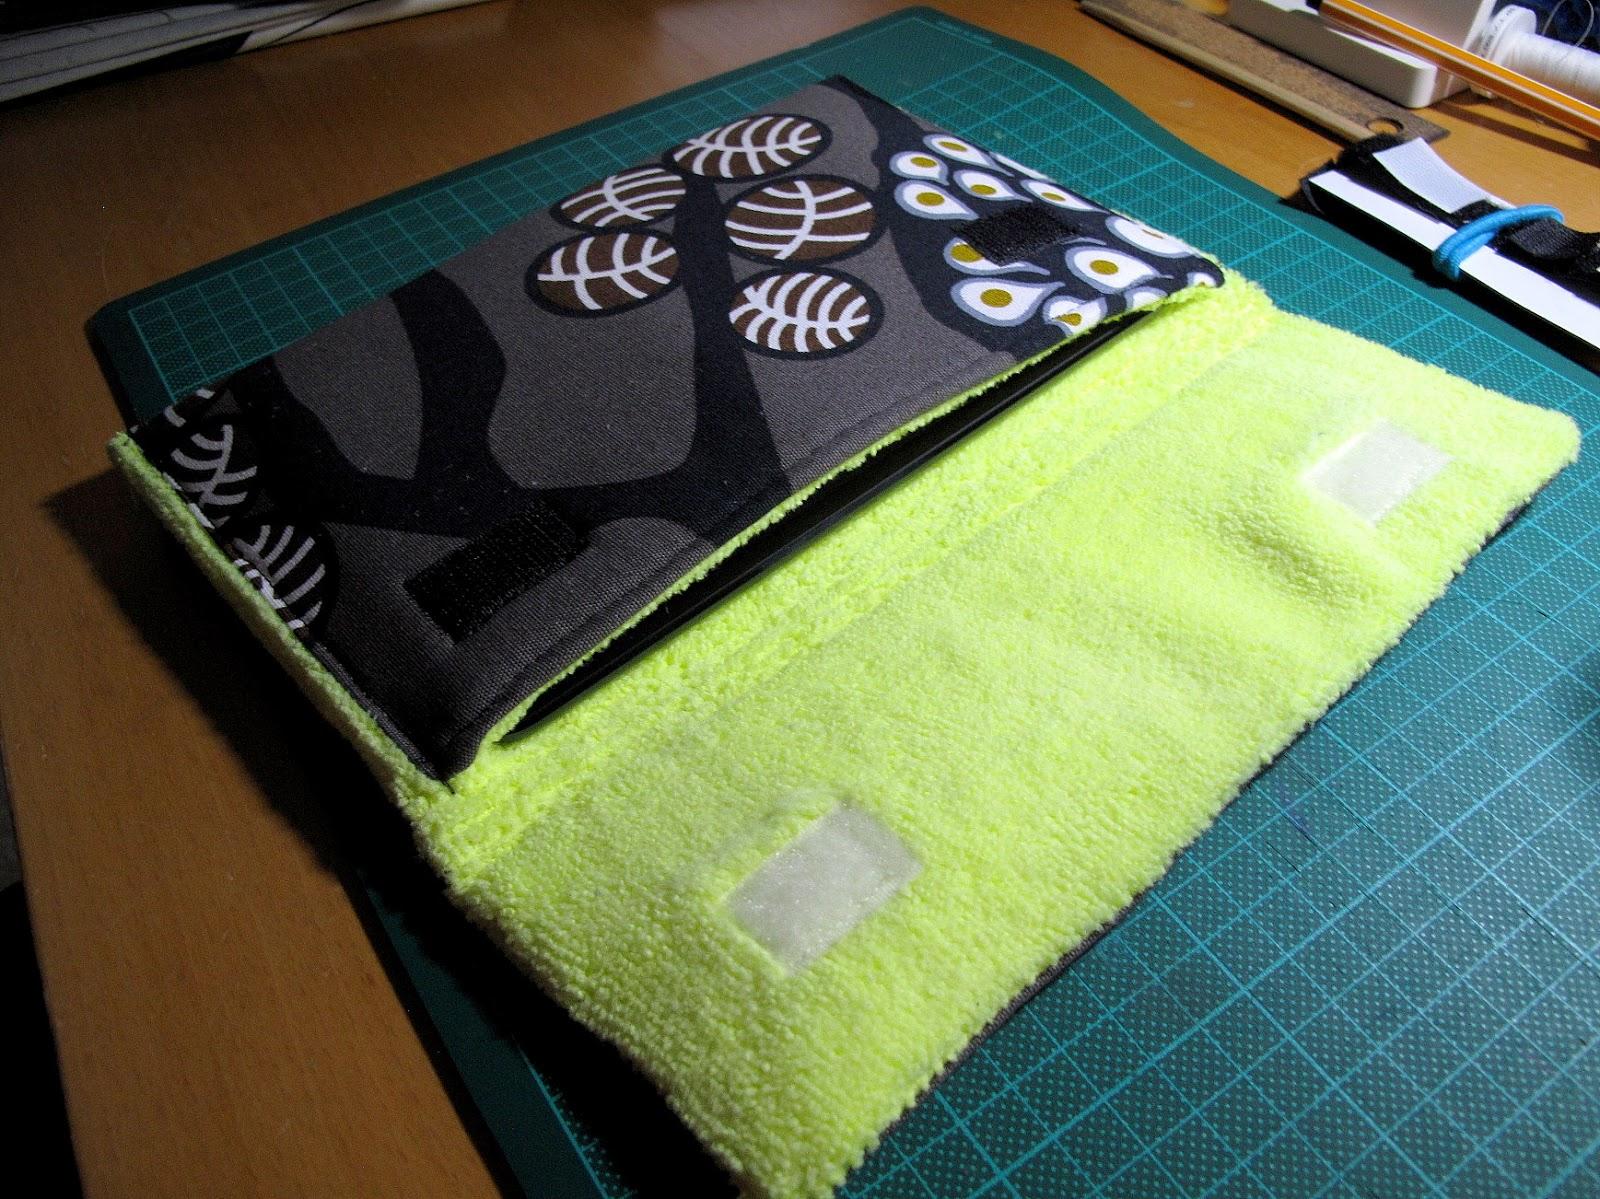 couture la maison sewing at home pochette pour ipad. Black Bedroom Furniture Sets. Home Design Ideas